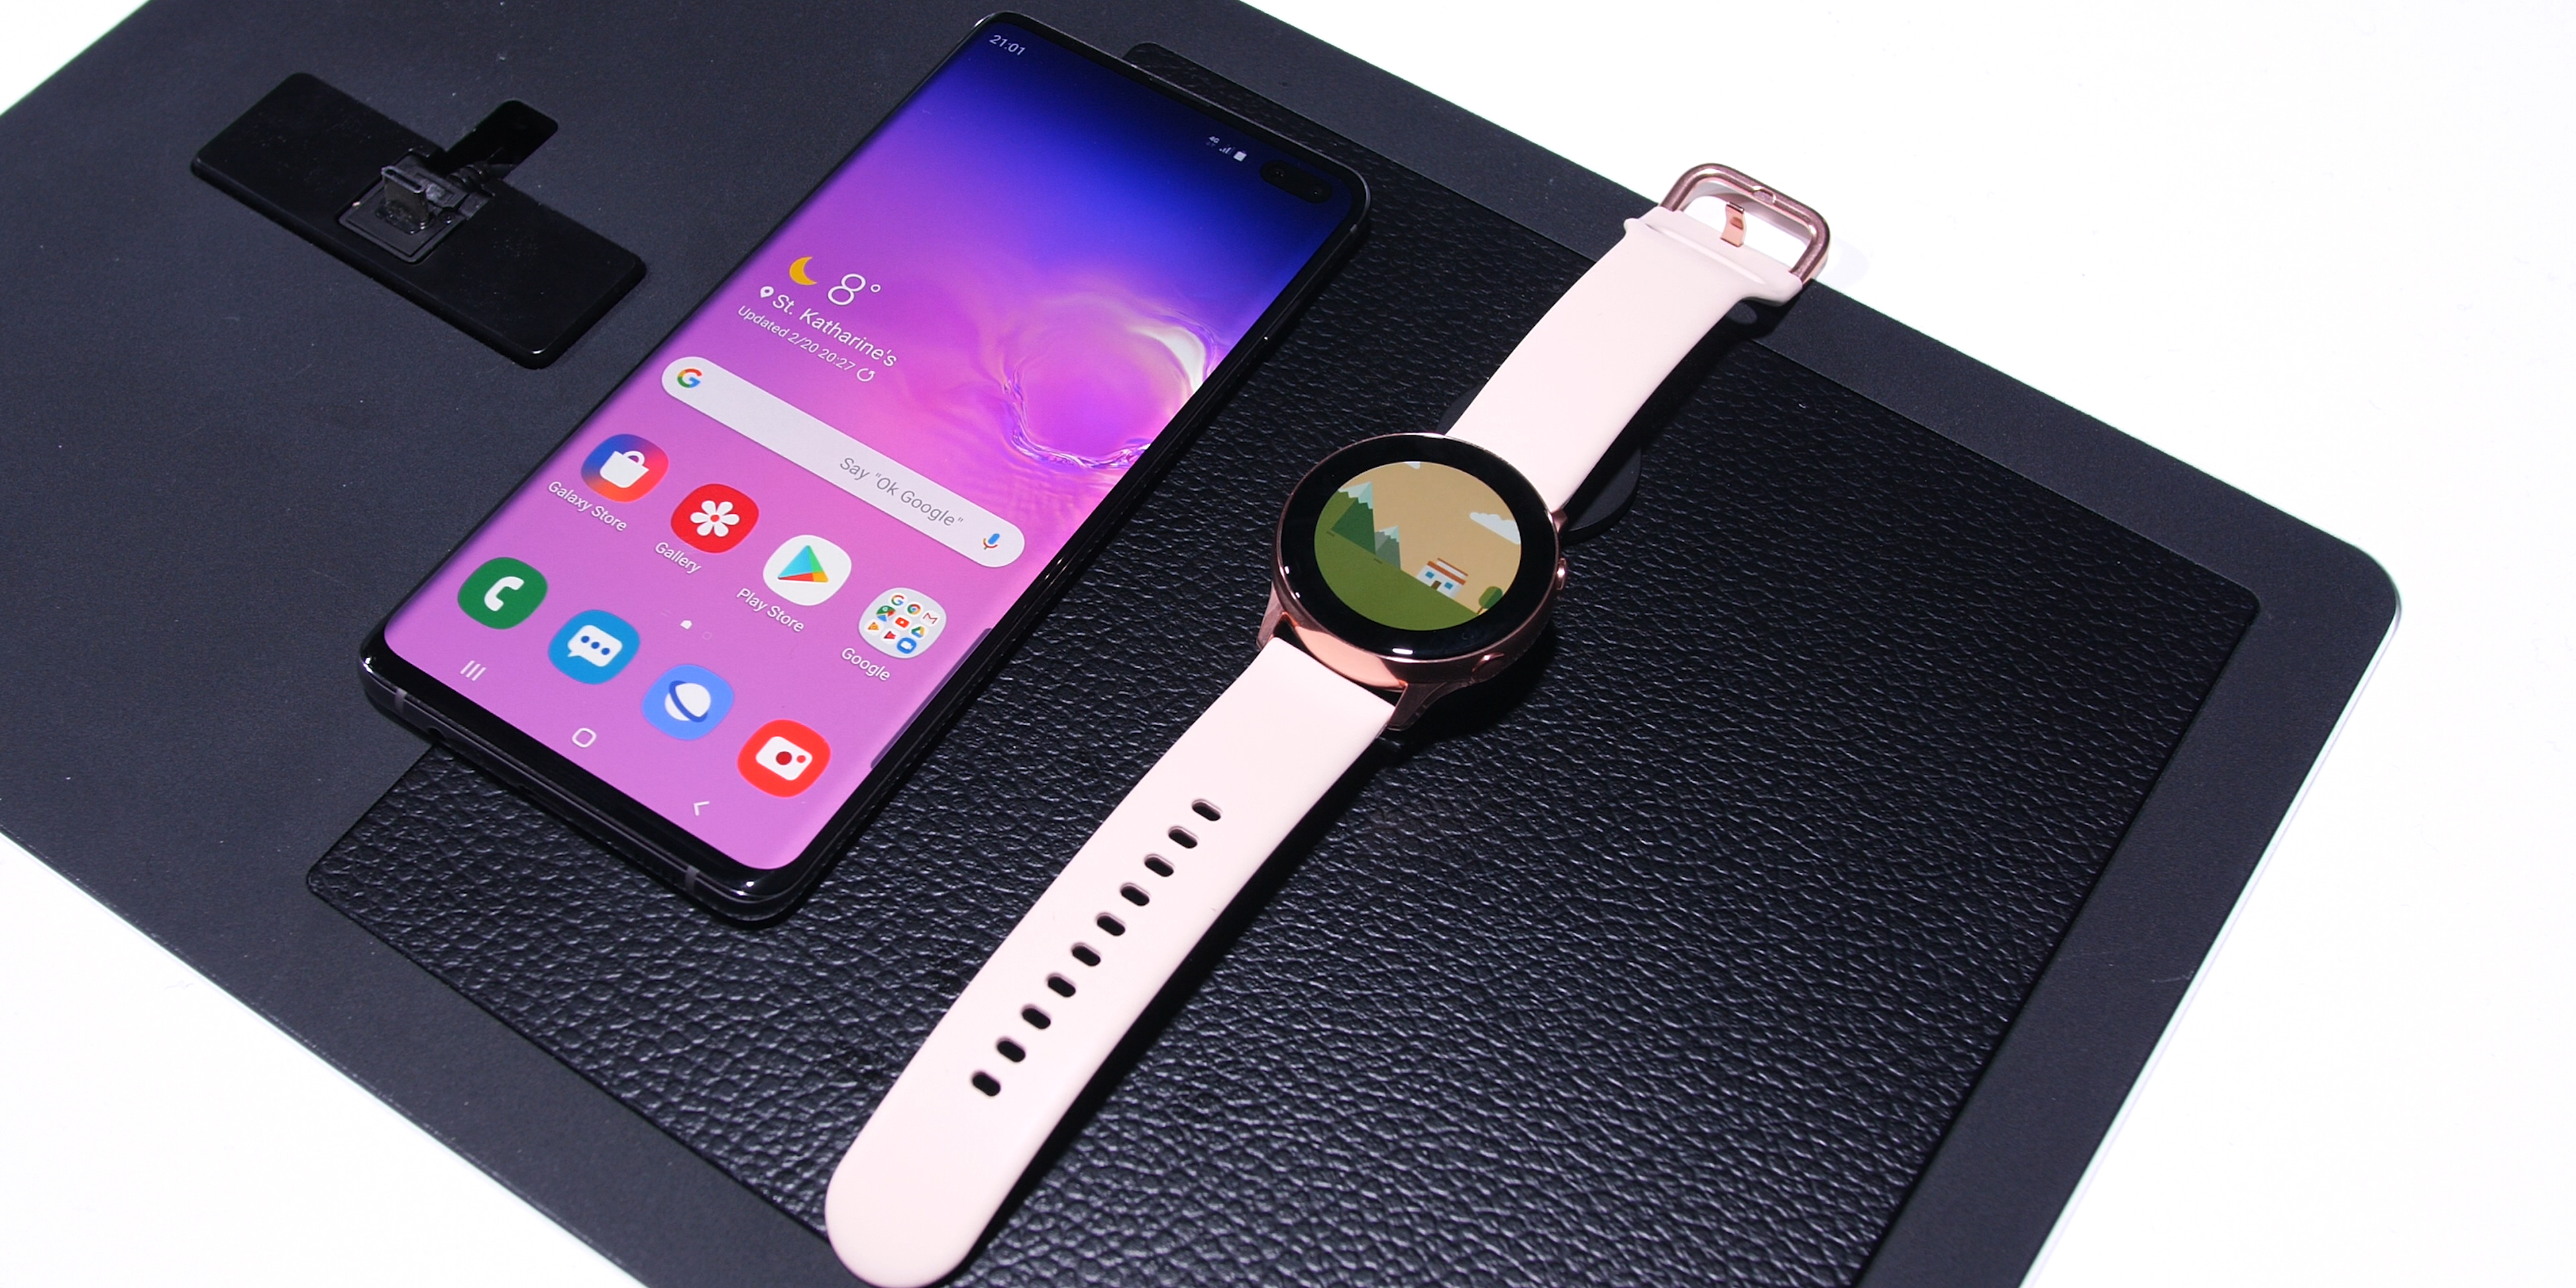 Samsung Galaxy Watch Active hardware and design